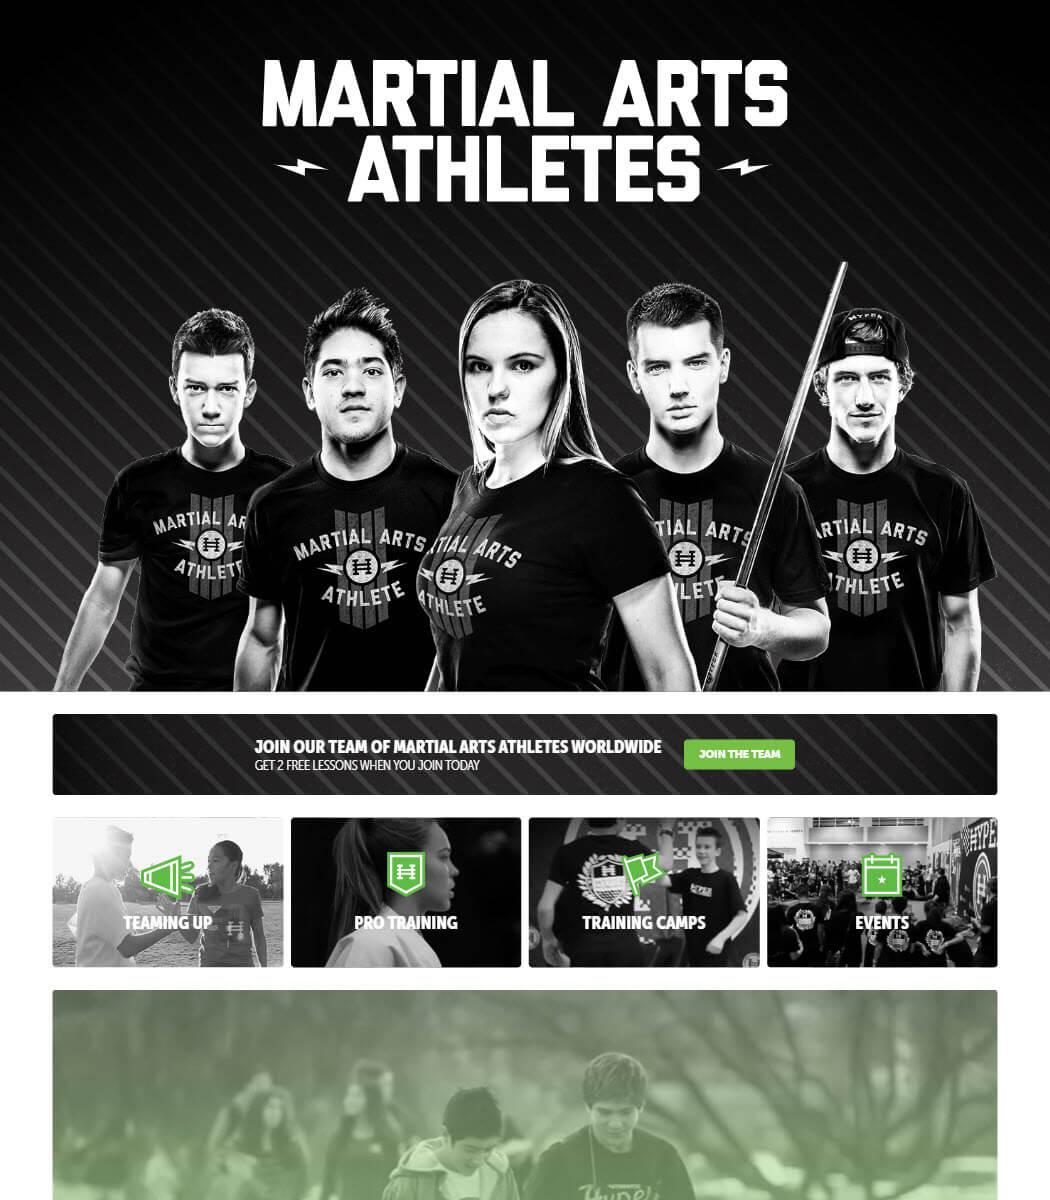 Martial Arts Athletes Website